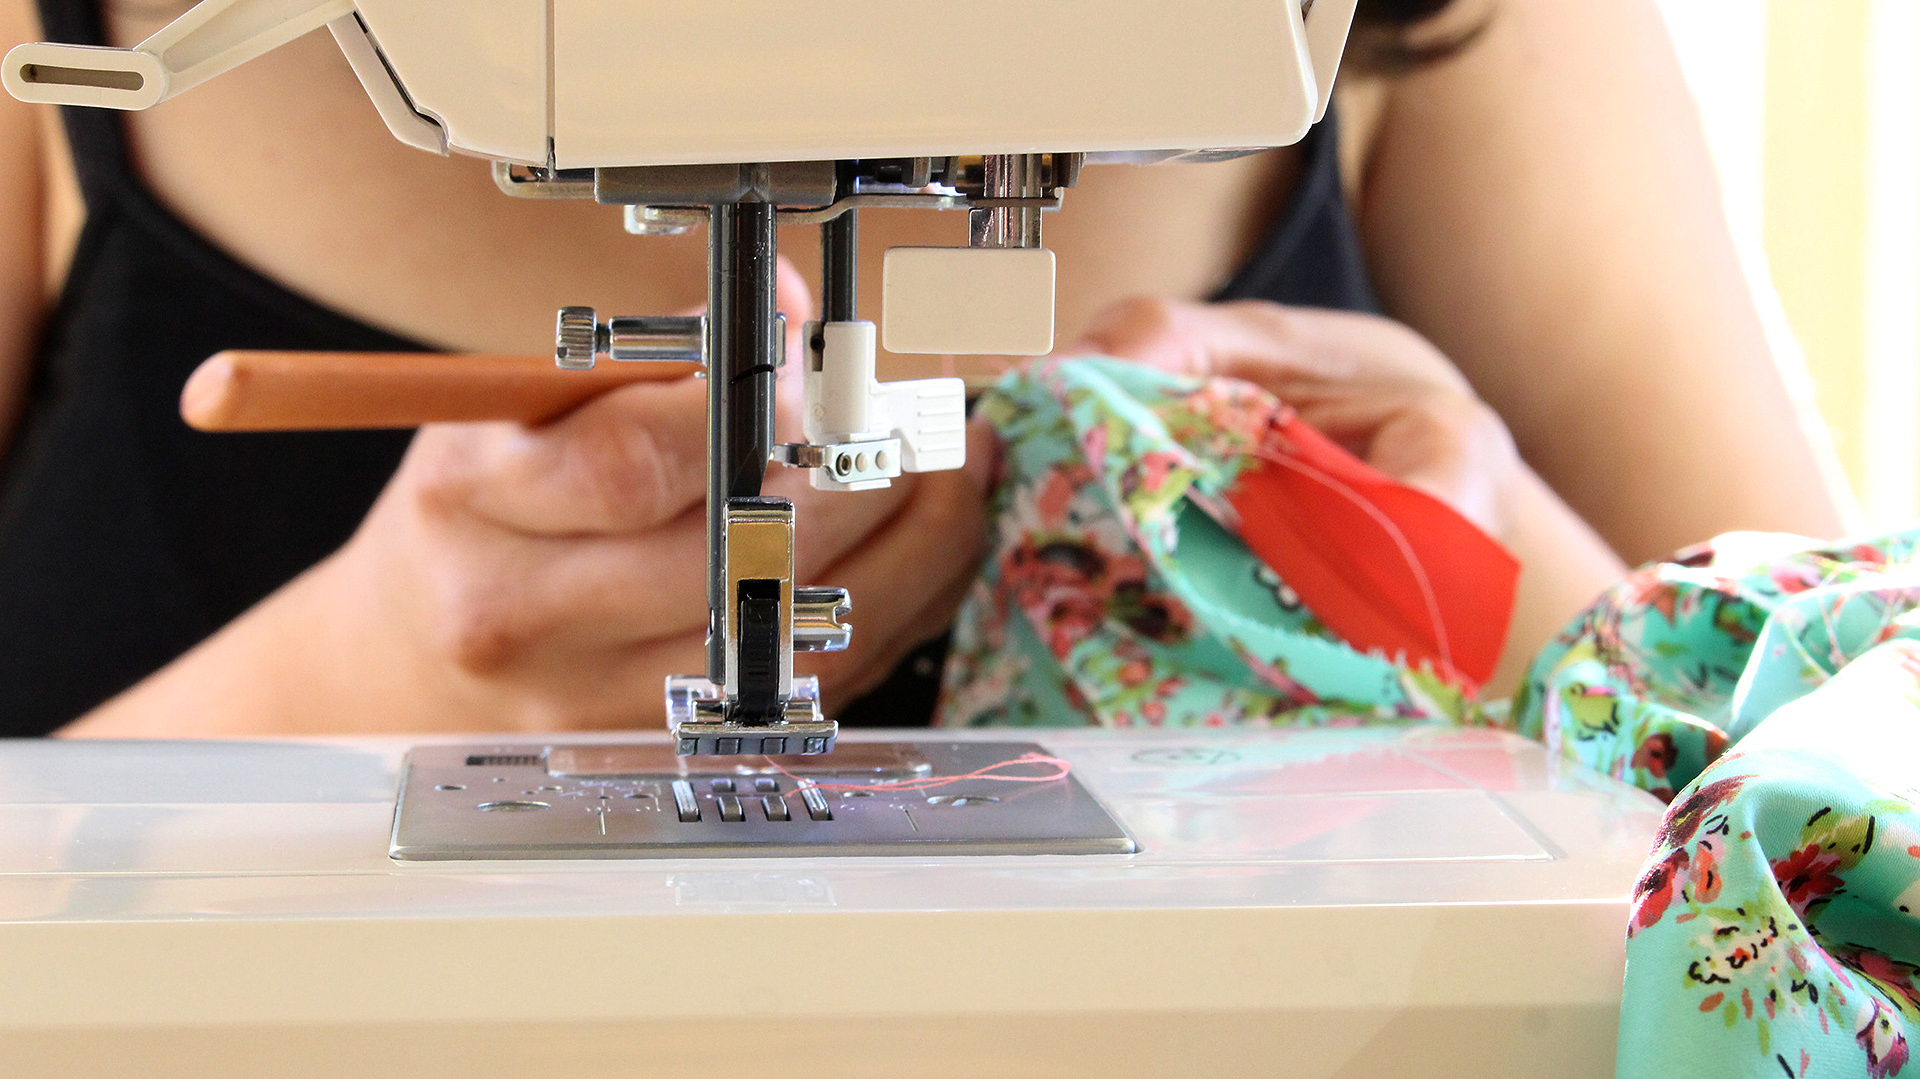 Using a seam ripper on my Alamada Robe | @vintageontap